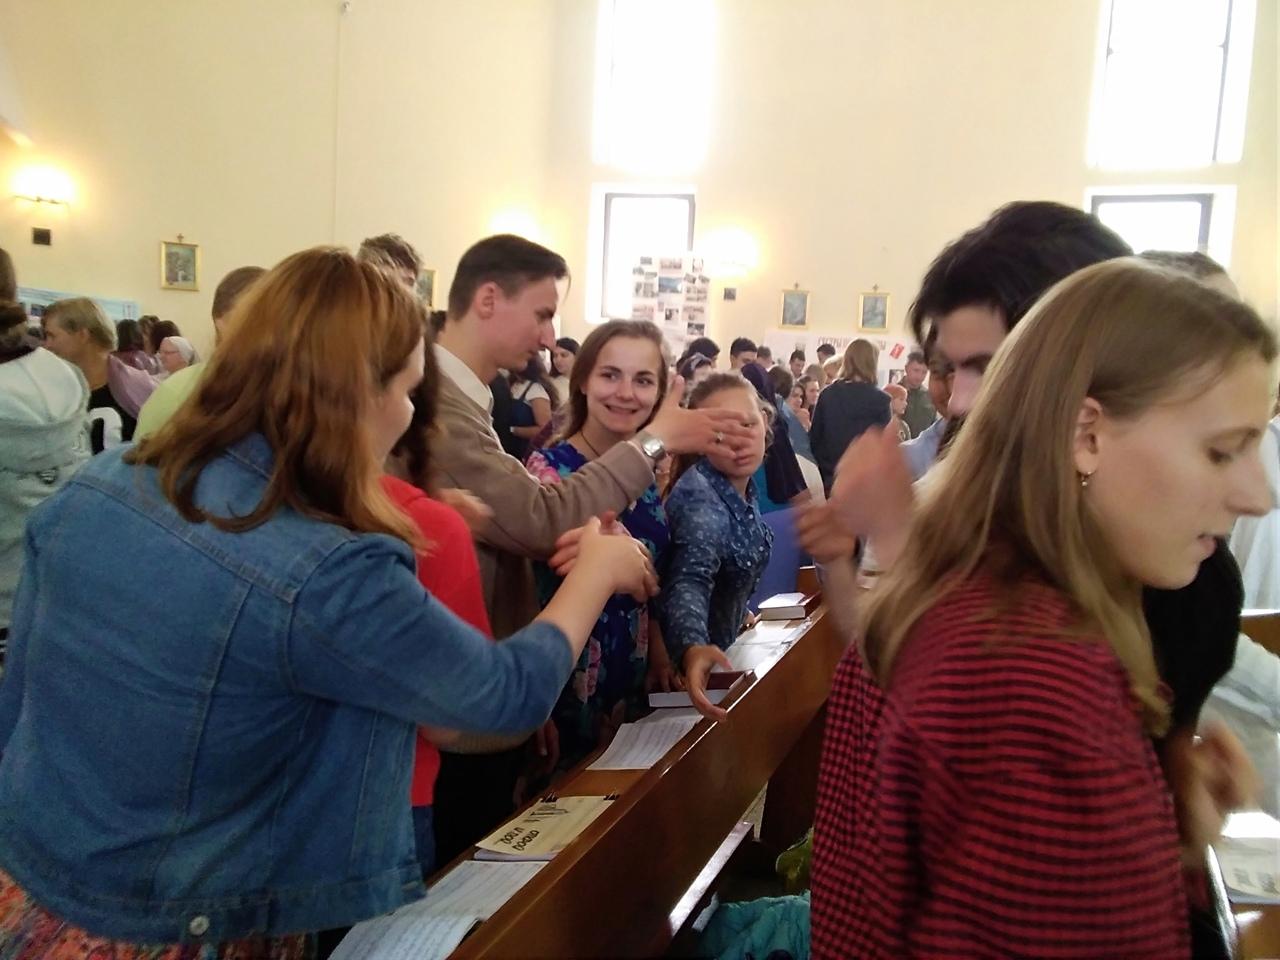 Знакомства в иркутске молодежь знакомства с мужчинами от 50 лет в казани